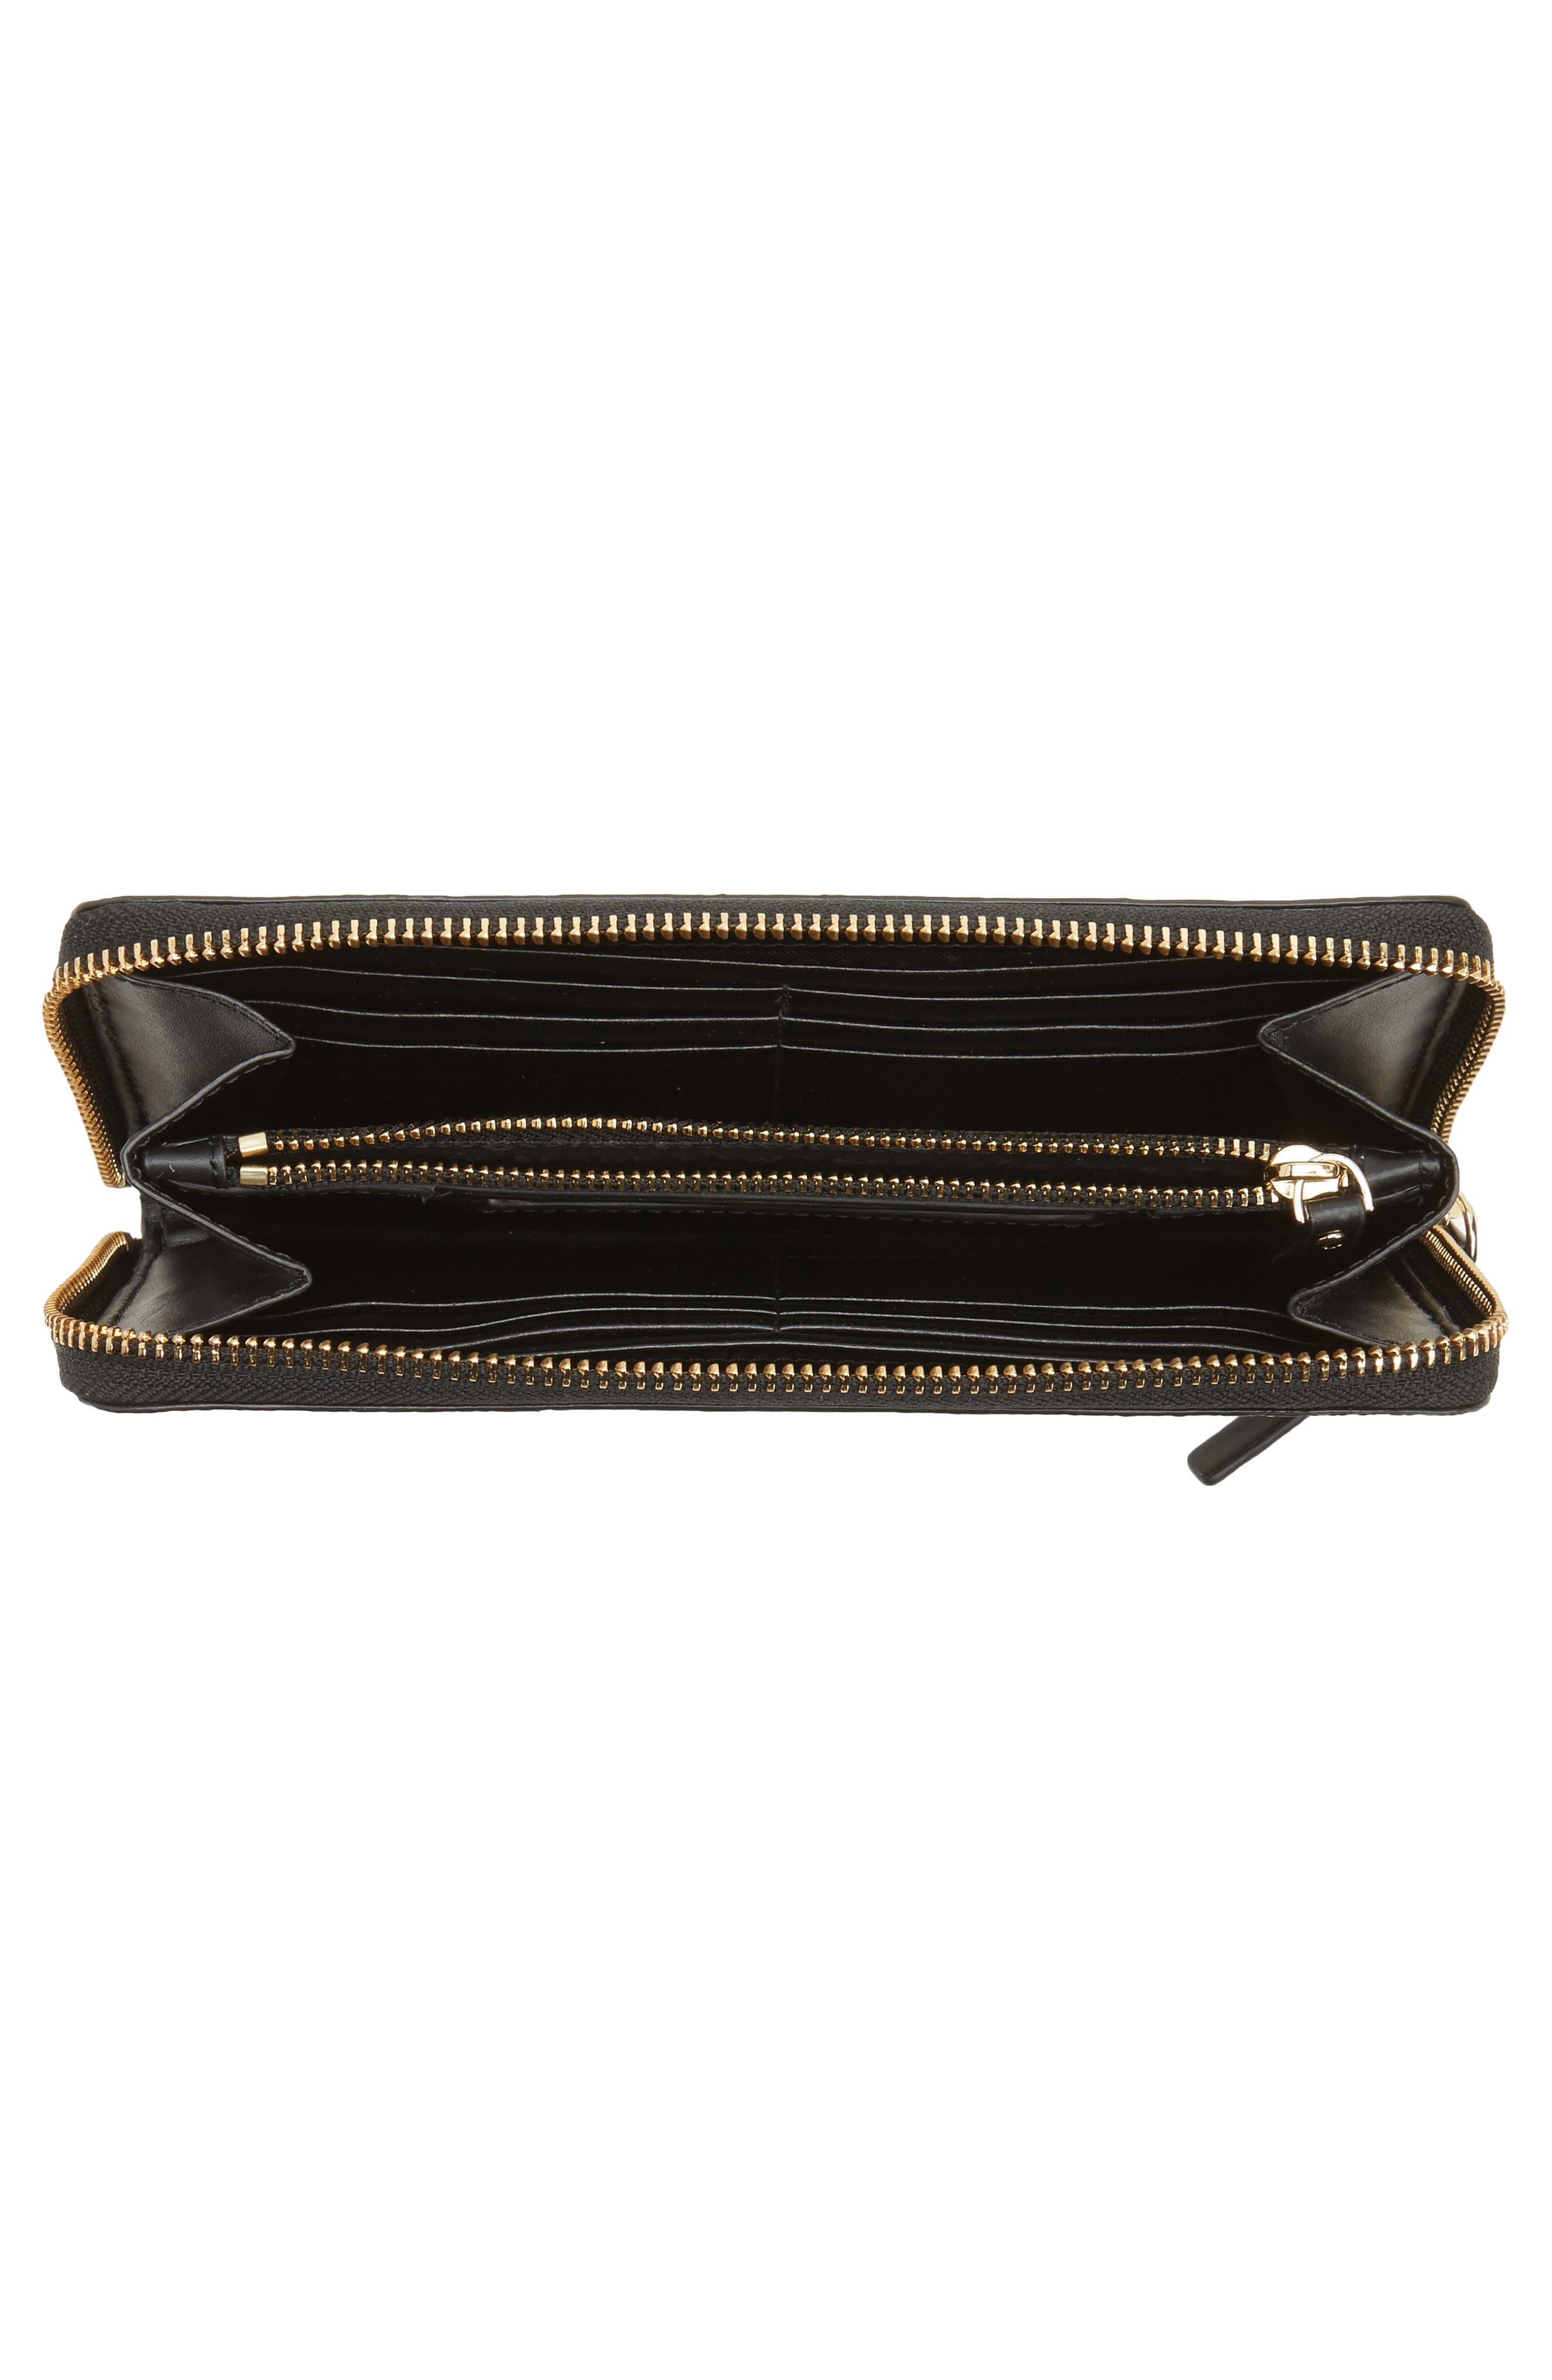 hyde lane - michele stripe wallet,                             Alternate thumbnail 2, color,                             Black/ Cream